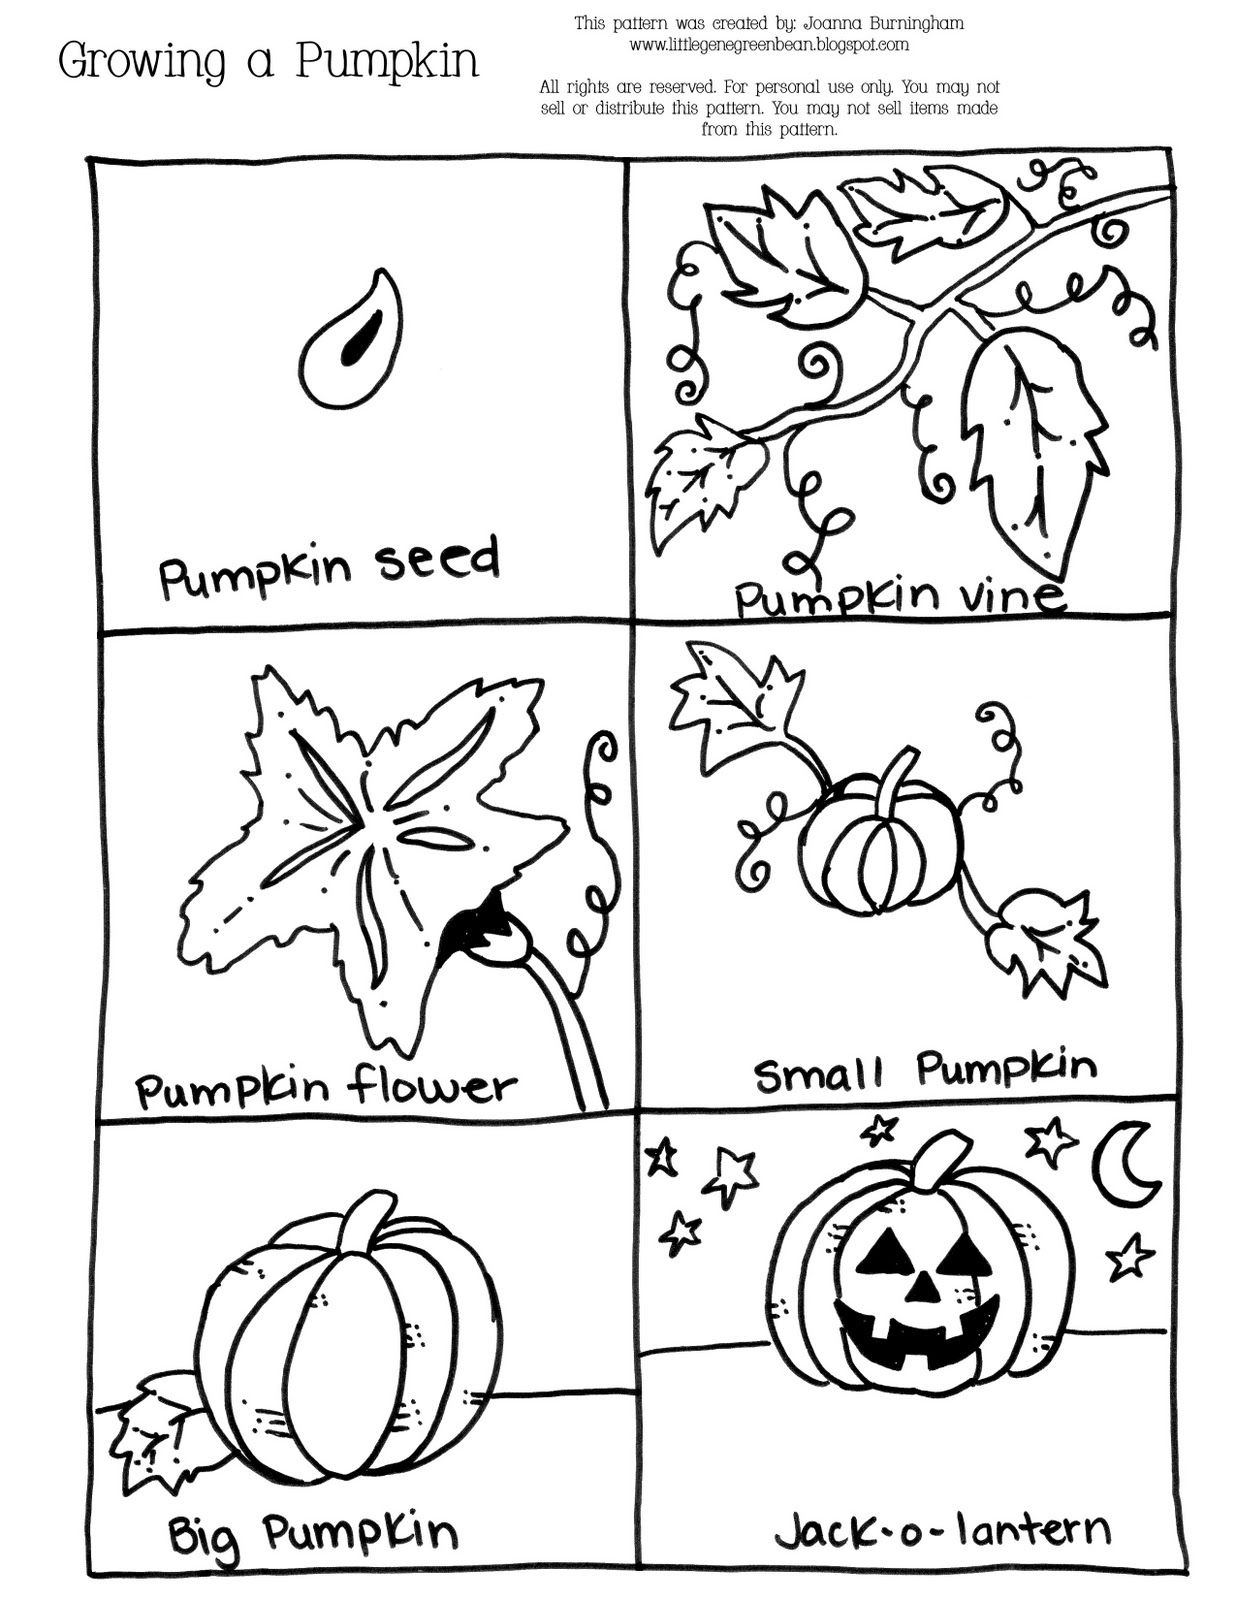 Pumpkin Growth Sequencing Sheet Halloween Repinned By